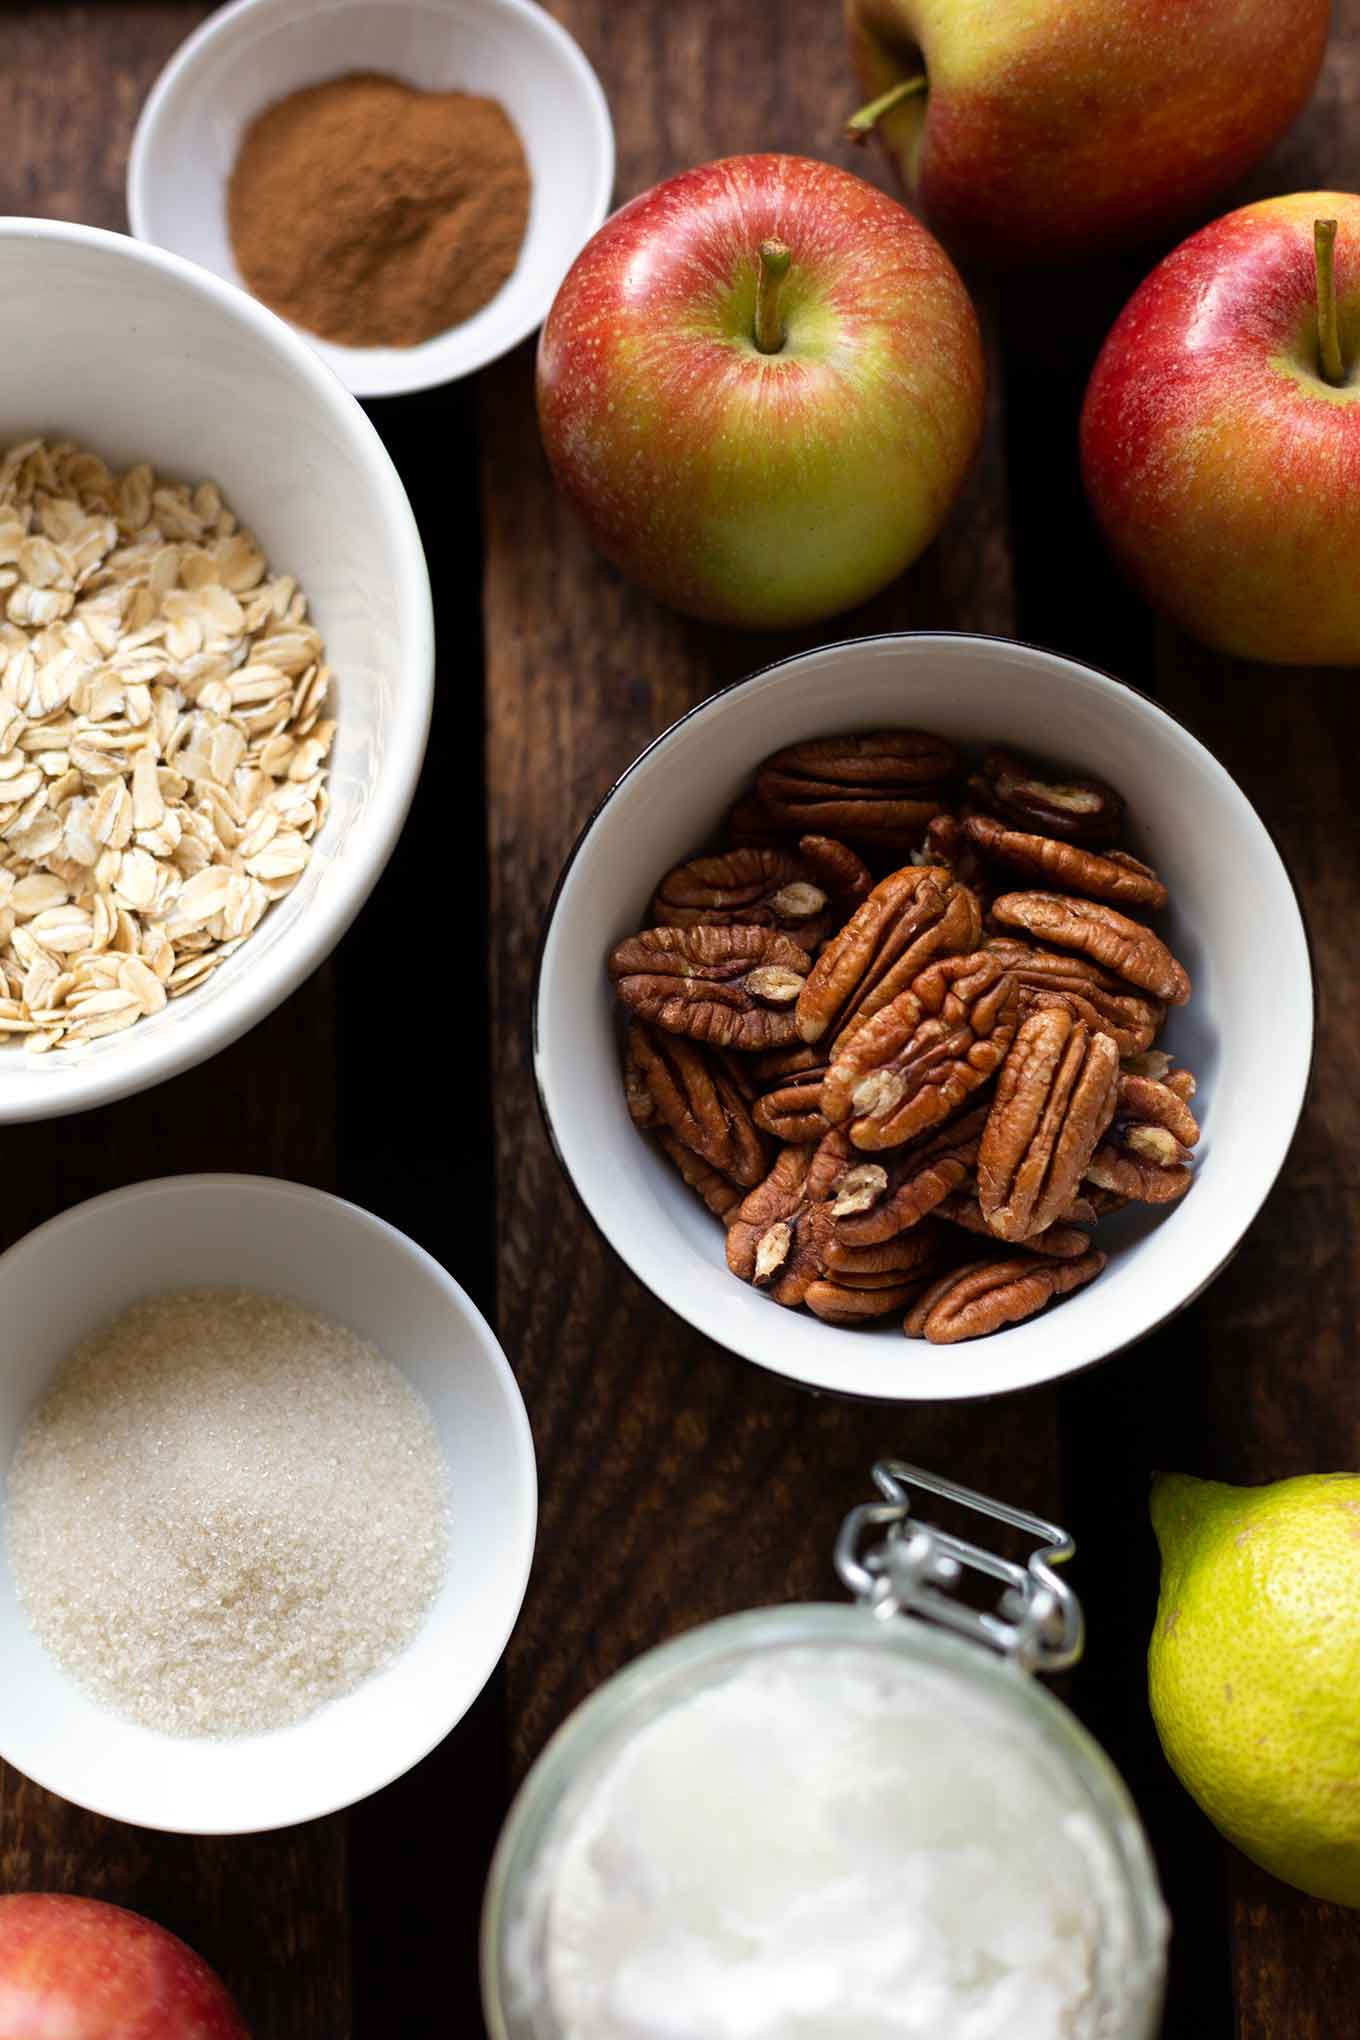 Bombastischer Apple Crisp. Dieses schnelle Rezept ist vegan, super einfach und kommt garantiert gut an! #applecrisp #herbstrezept #soulfood #kochkarussell